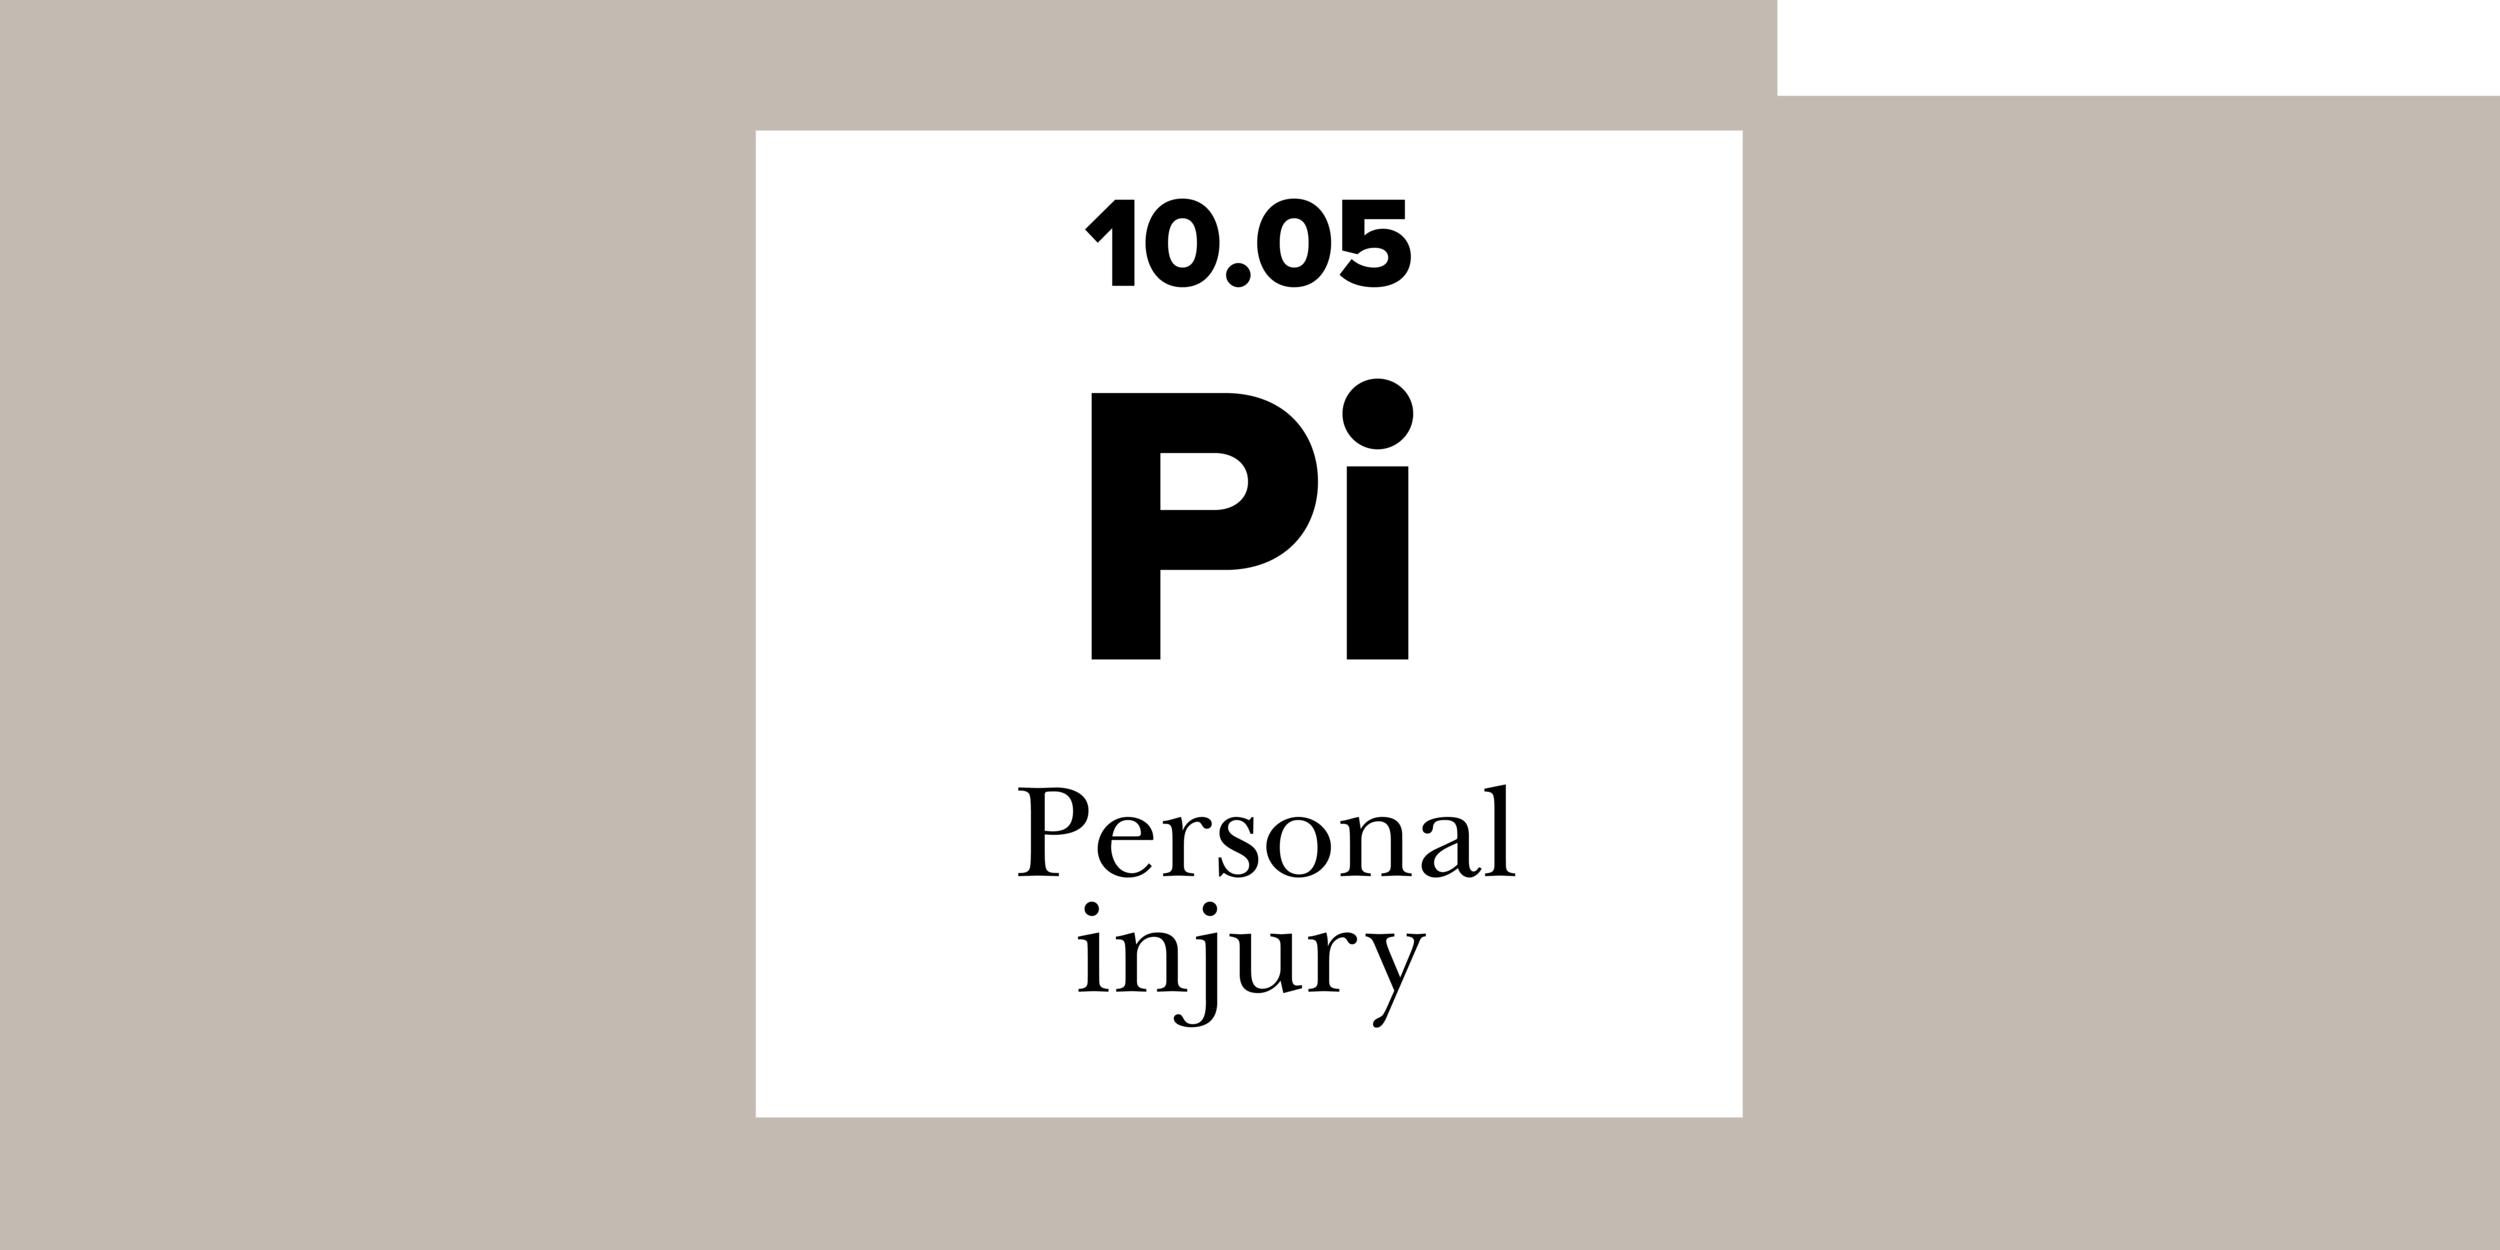 180510_Personal_injury.png